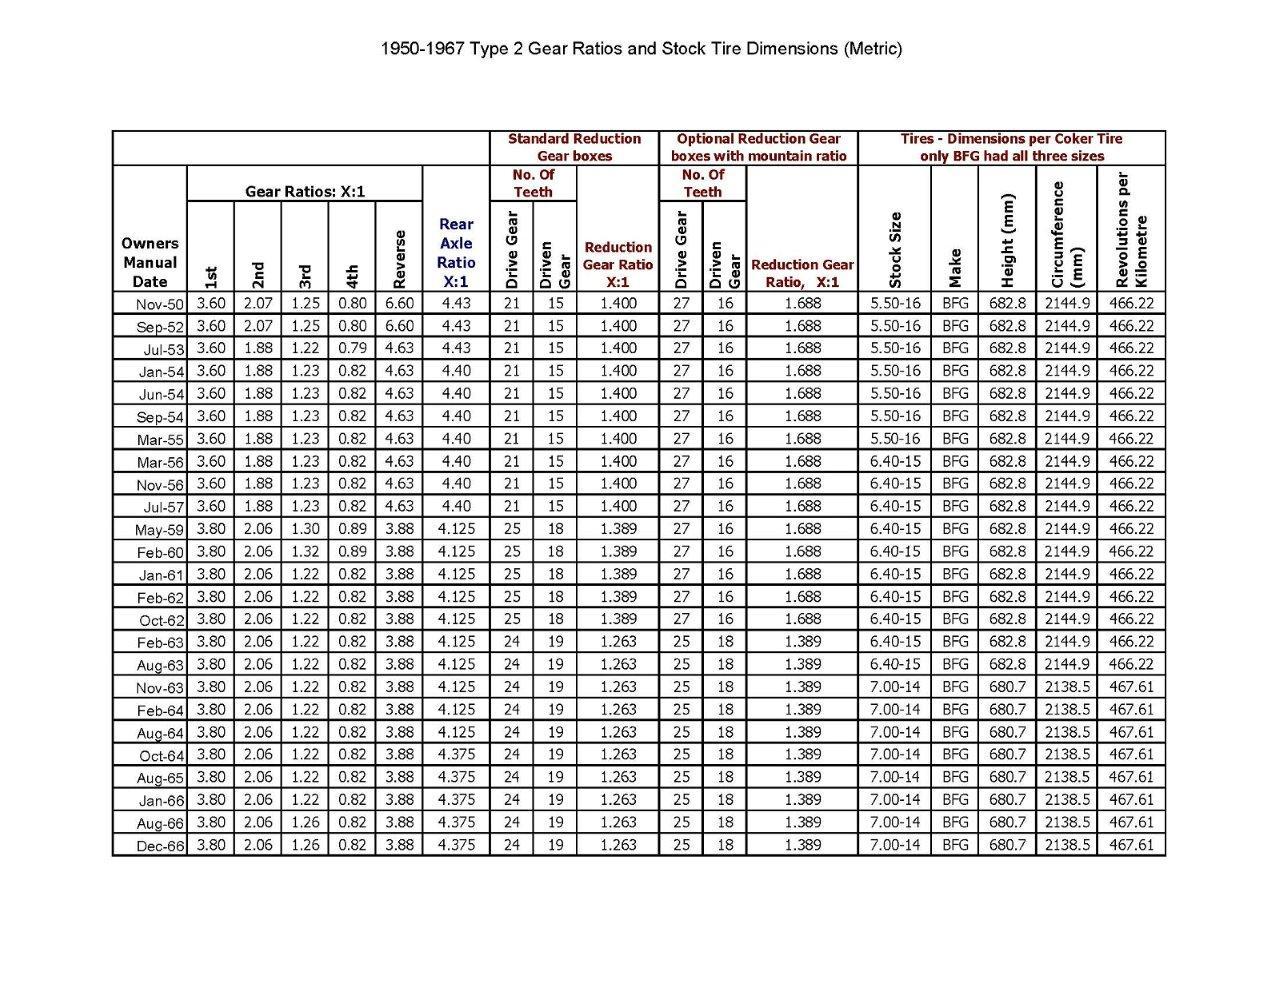 TheSamba com :: Split Bus - View topic - 1950-1967 Type 2 Gear Ratios